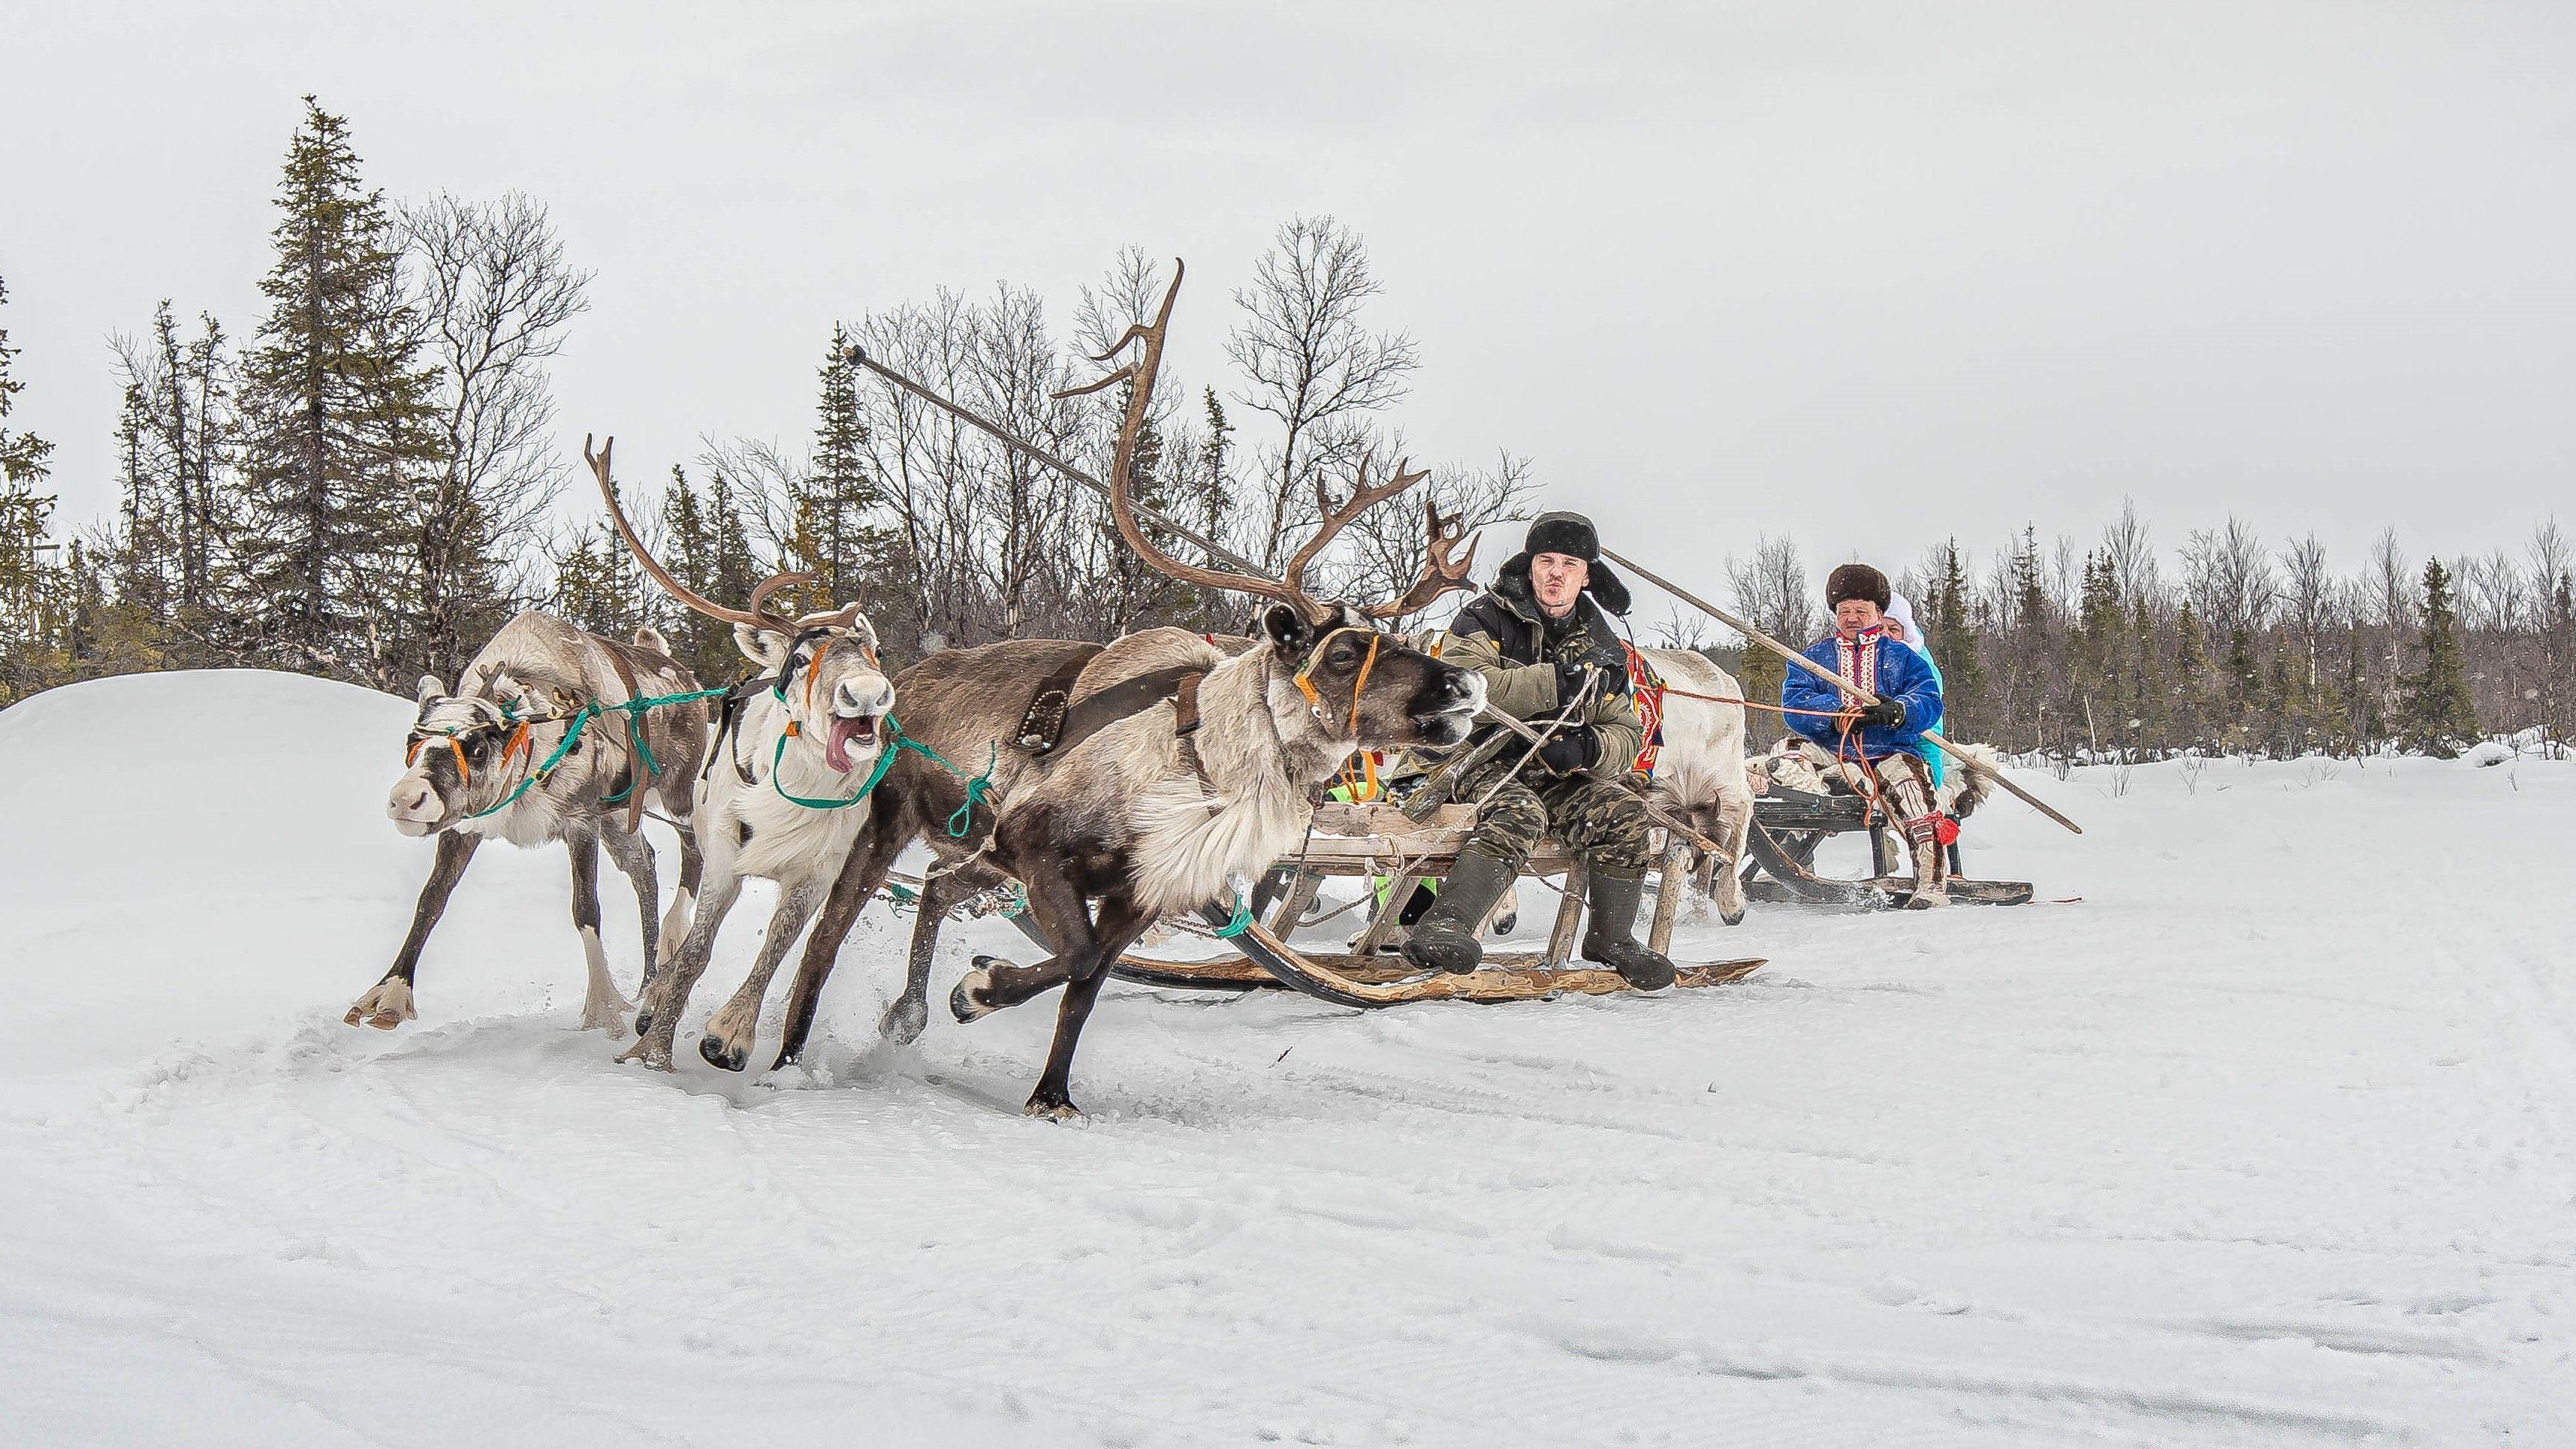 Спорт, оленеводы.Север, Kaverin Sergey